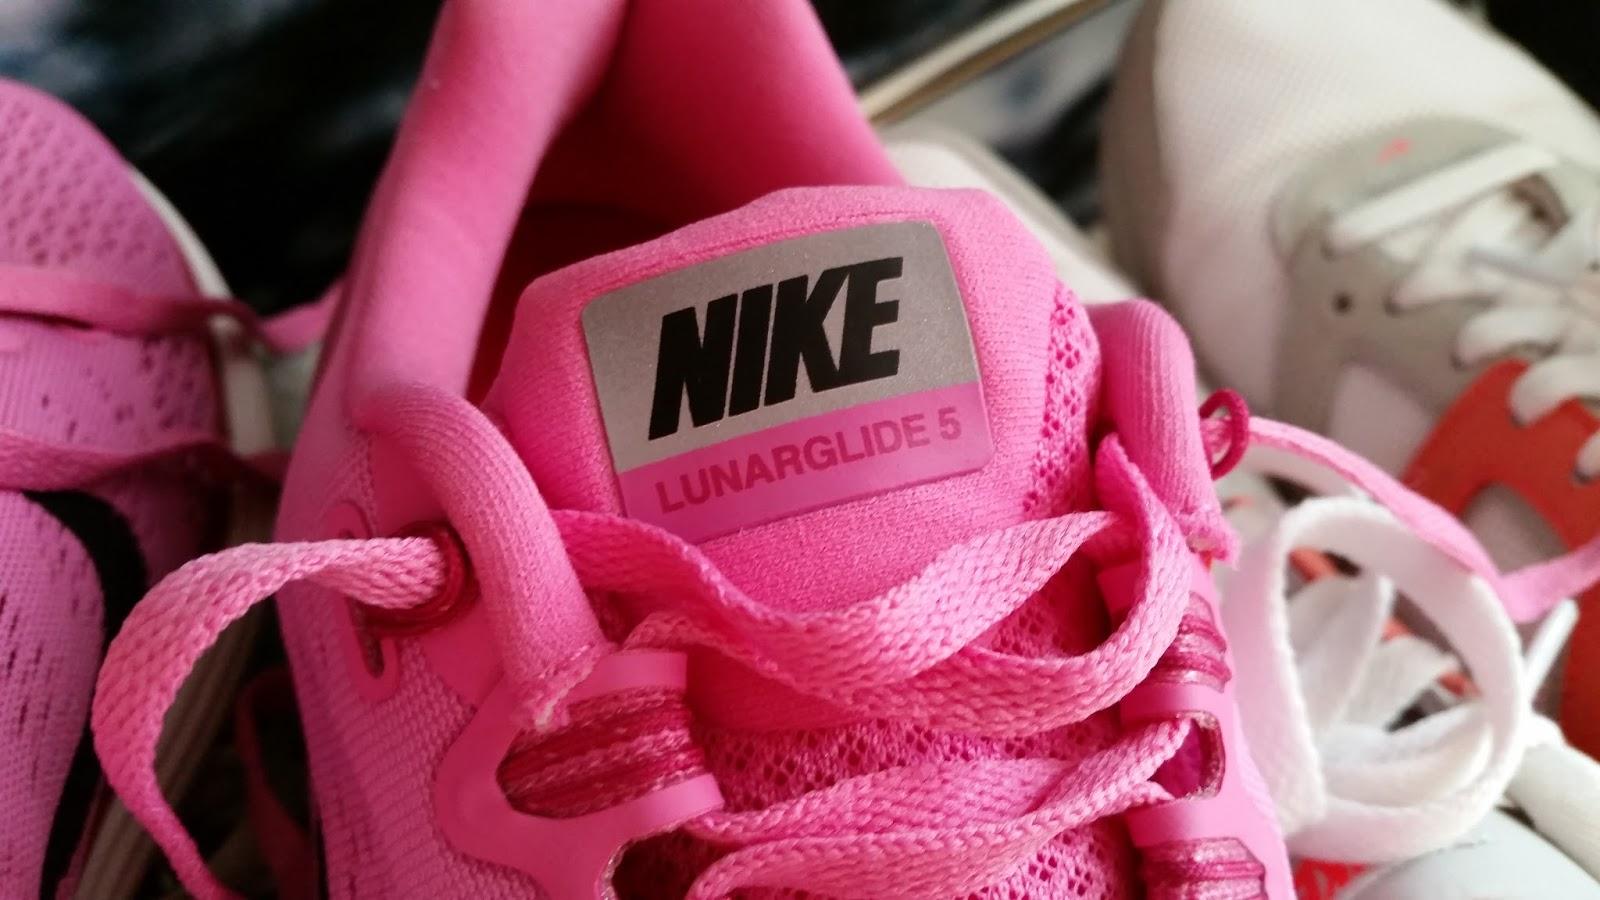 nike lunarglide 5, pink, runner, just do it